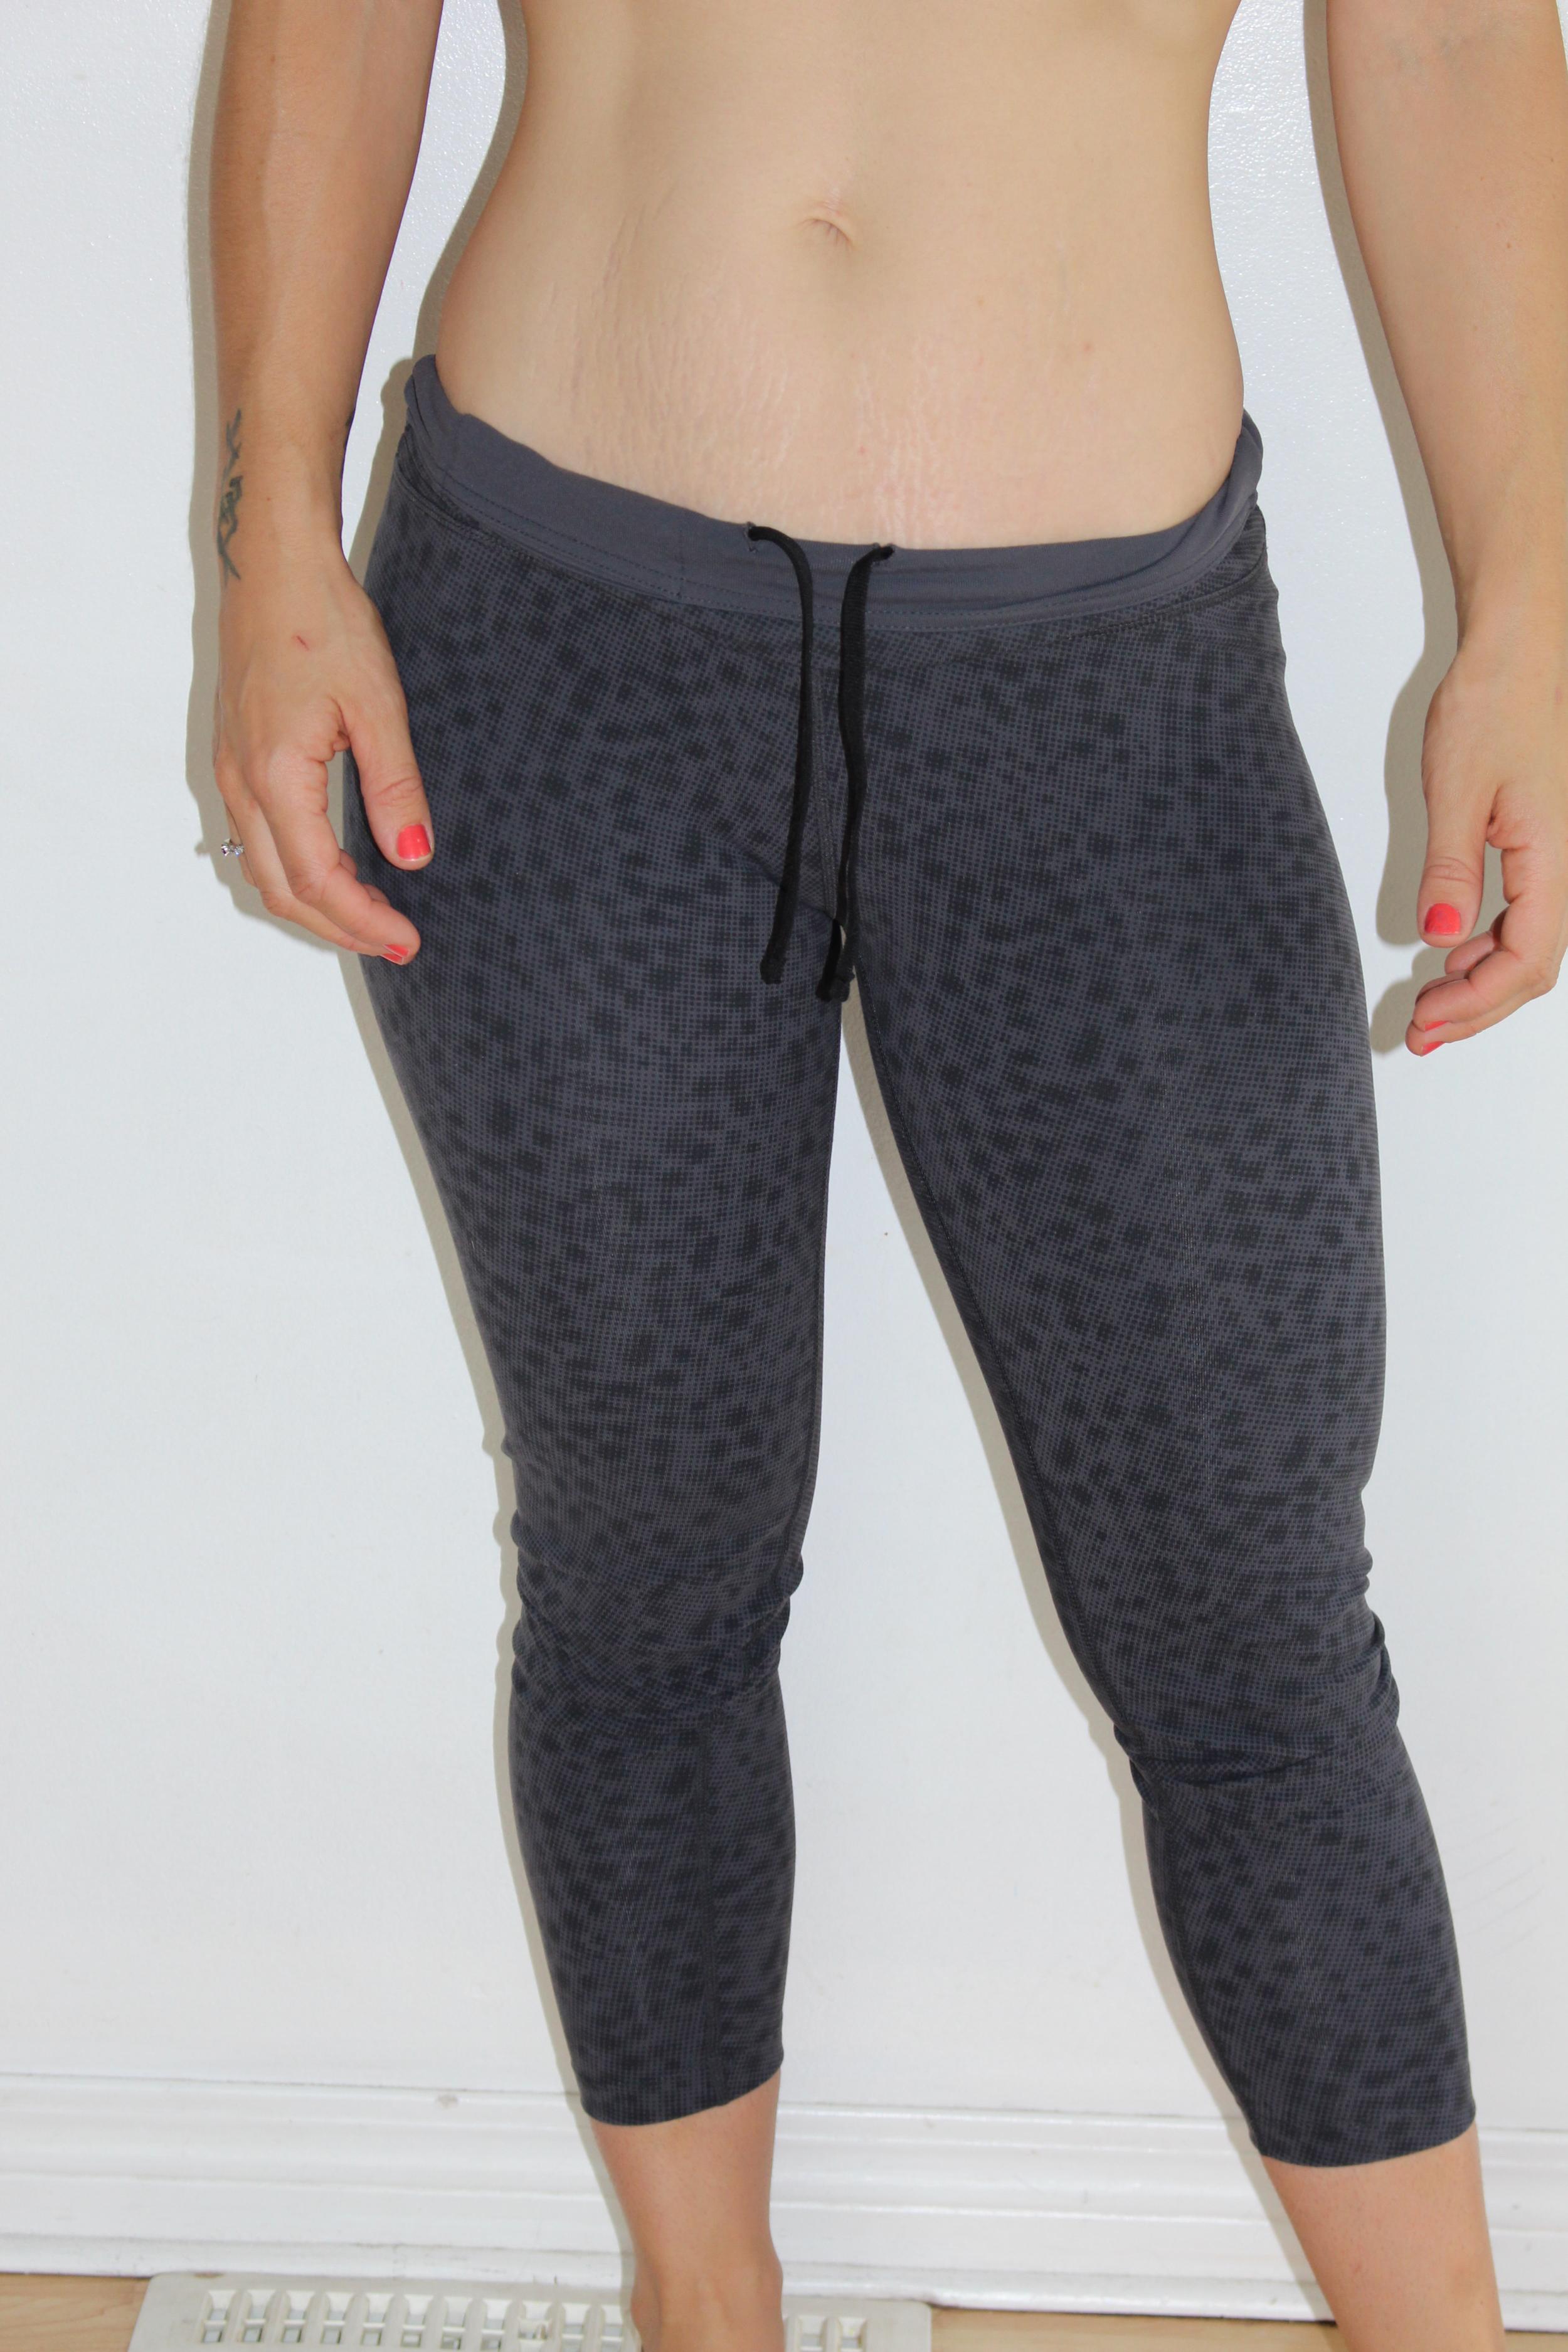 pants-and-bra-0231.jpg